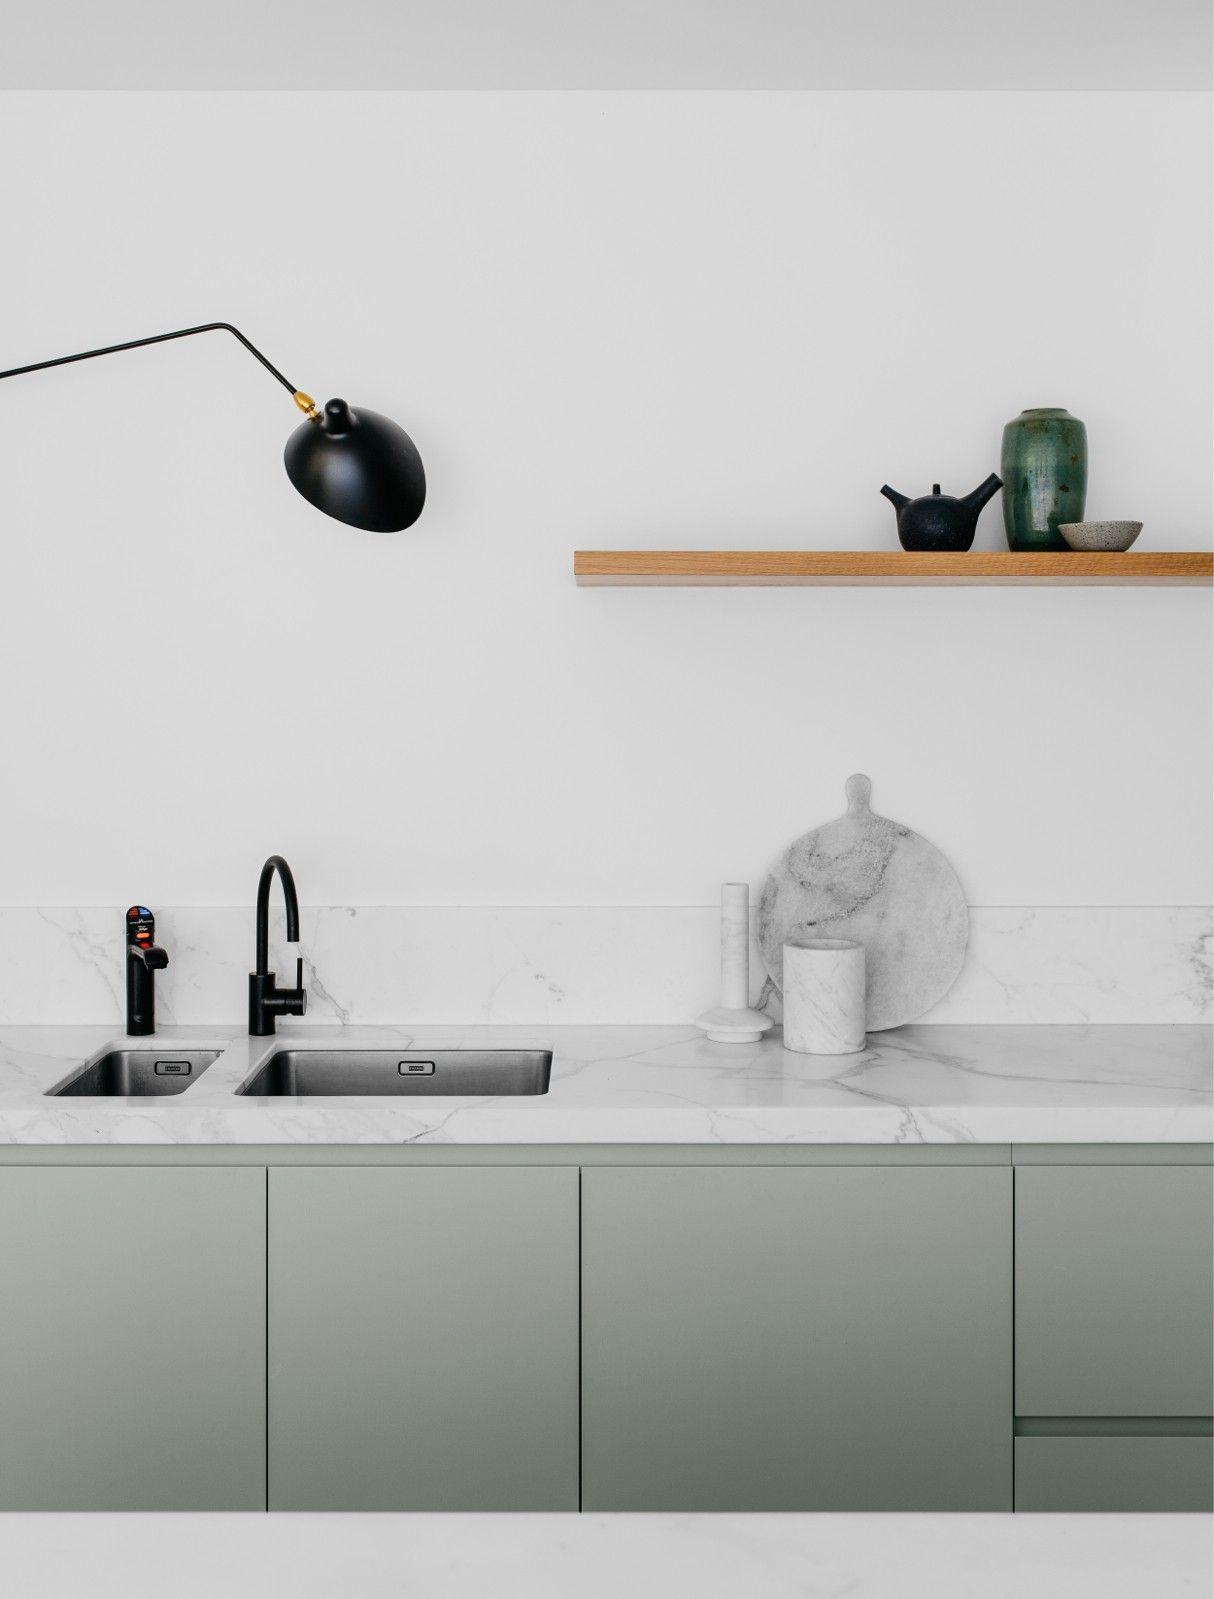 Küchendesign neuer stil feel amazed by discovering the best kitchen decor design here